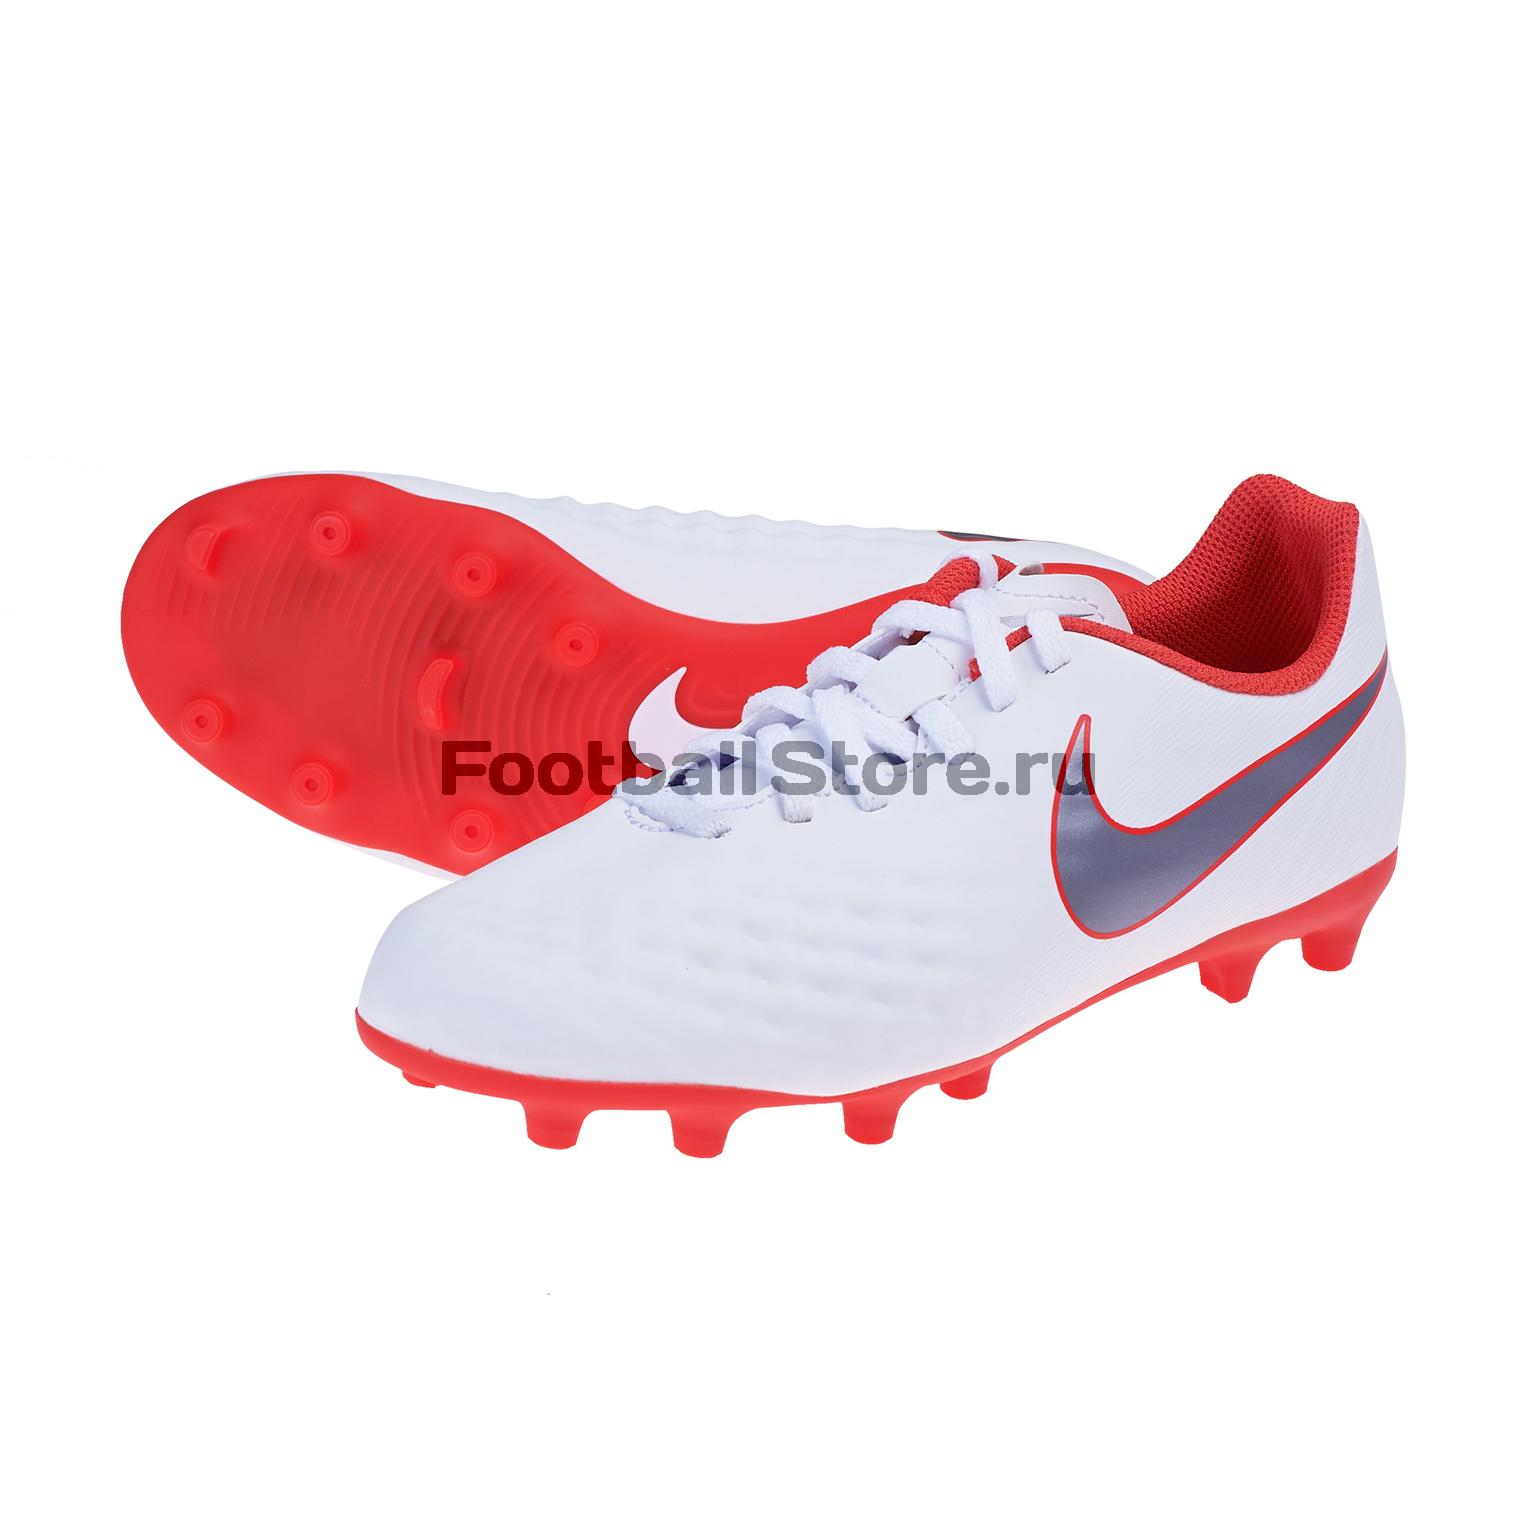 Бутсы детские Nike Obra 2 Club FG AH7314-107 бутсы nike jr obra 2 club fg ah7314 107